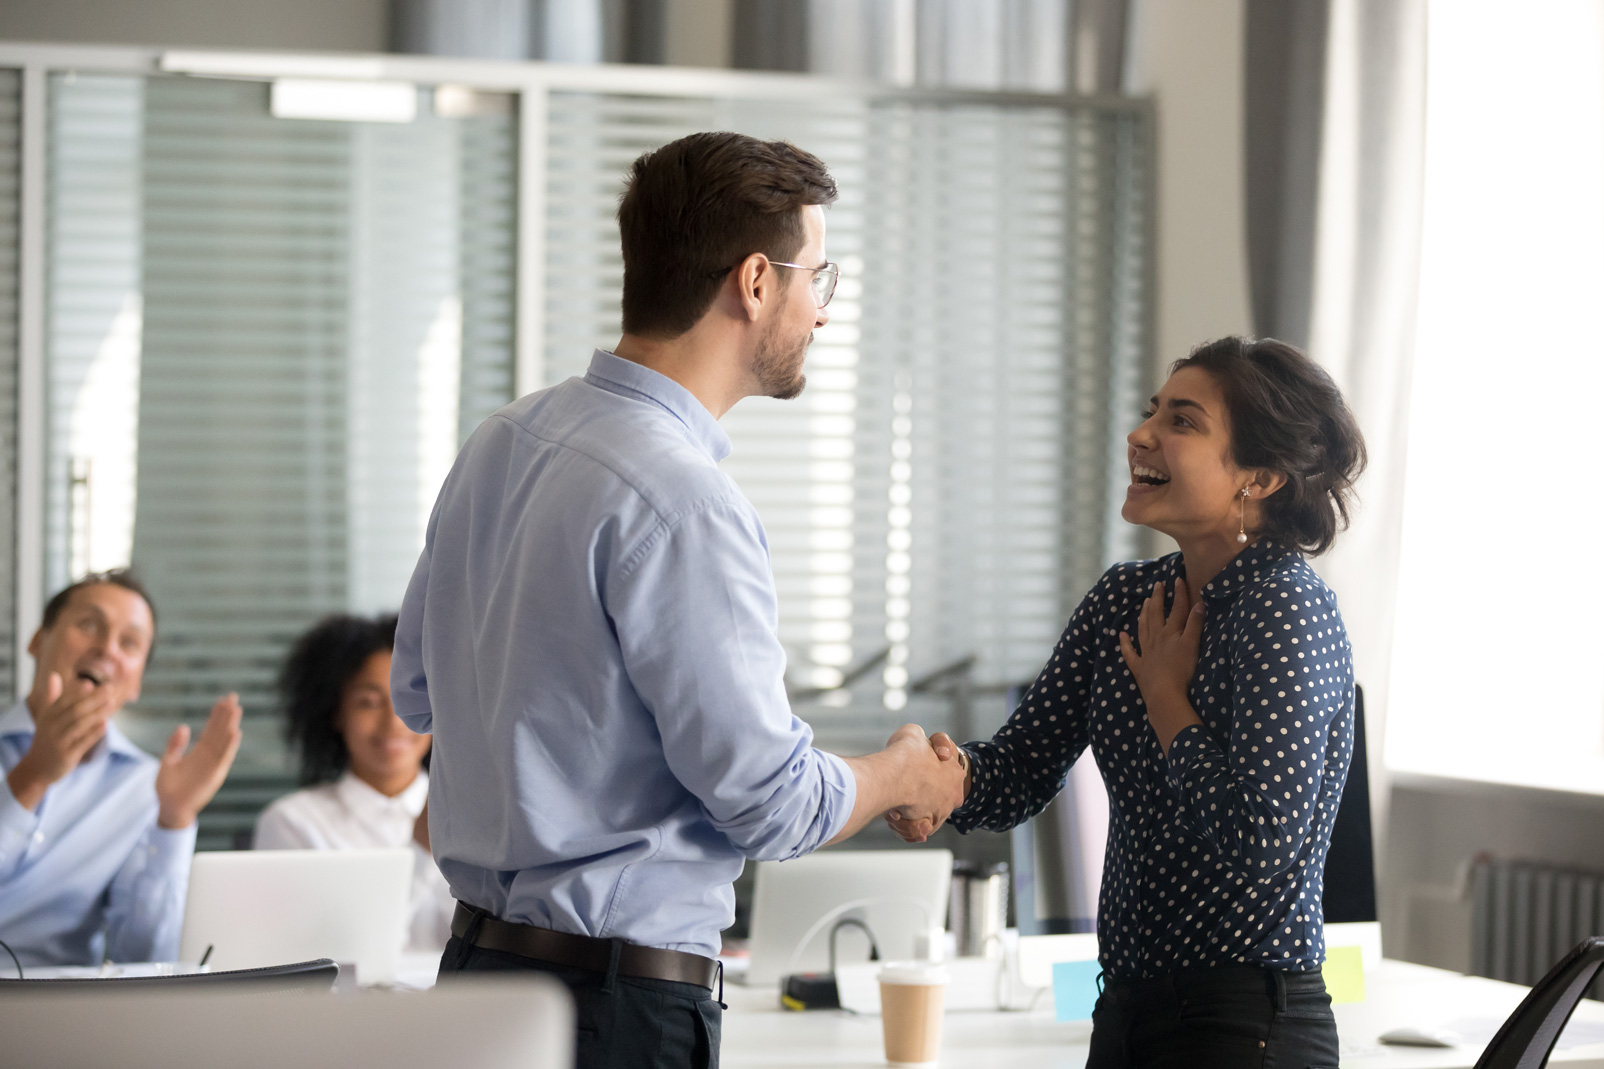 Positive Motivation vs Negative Motivation - What's Better For Your Business?